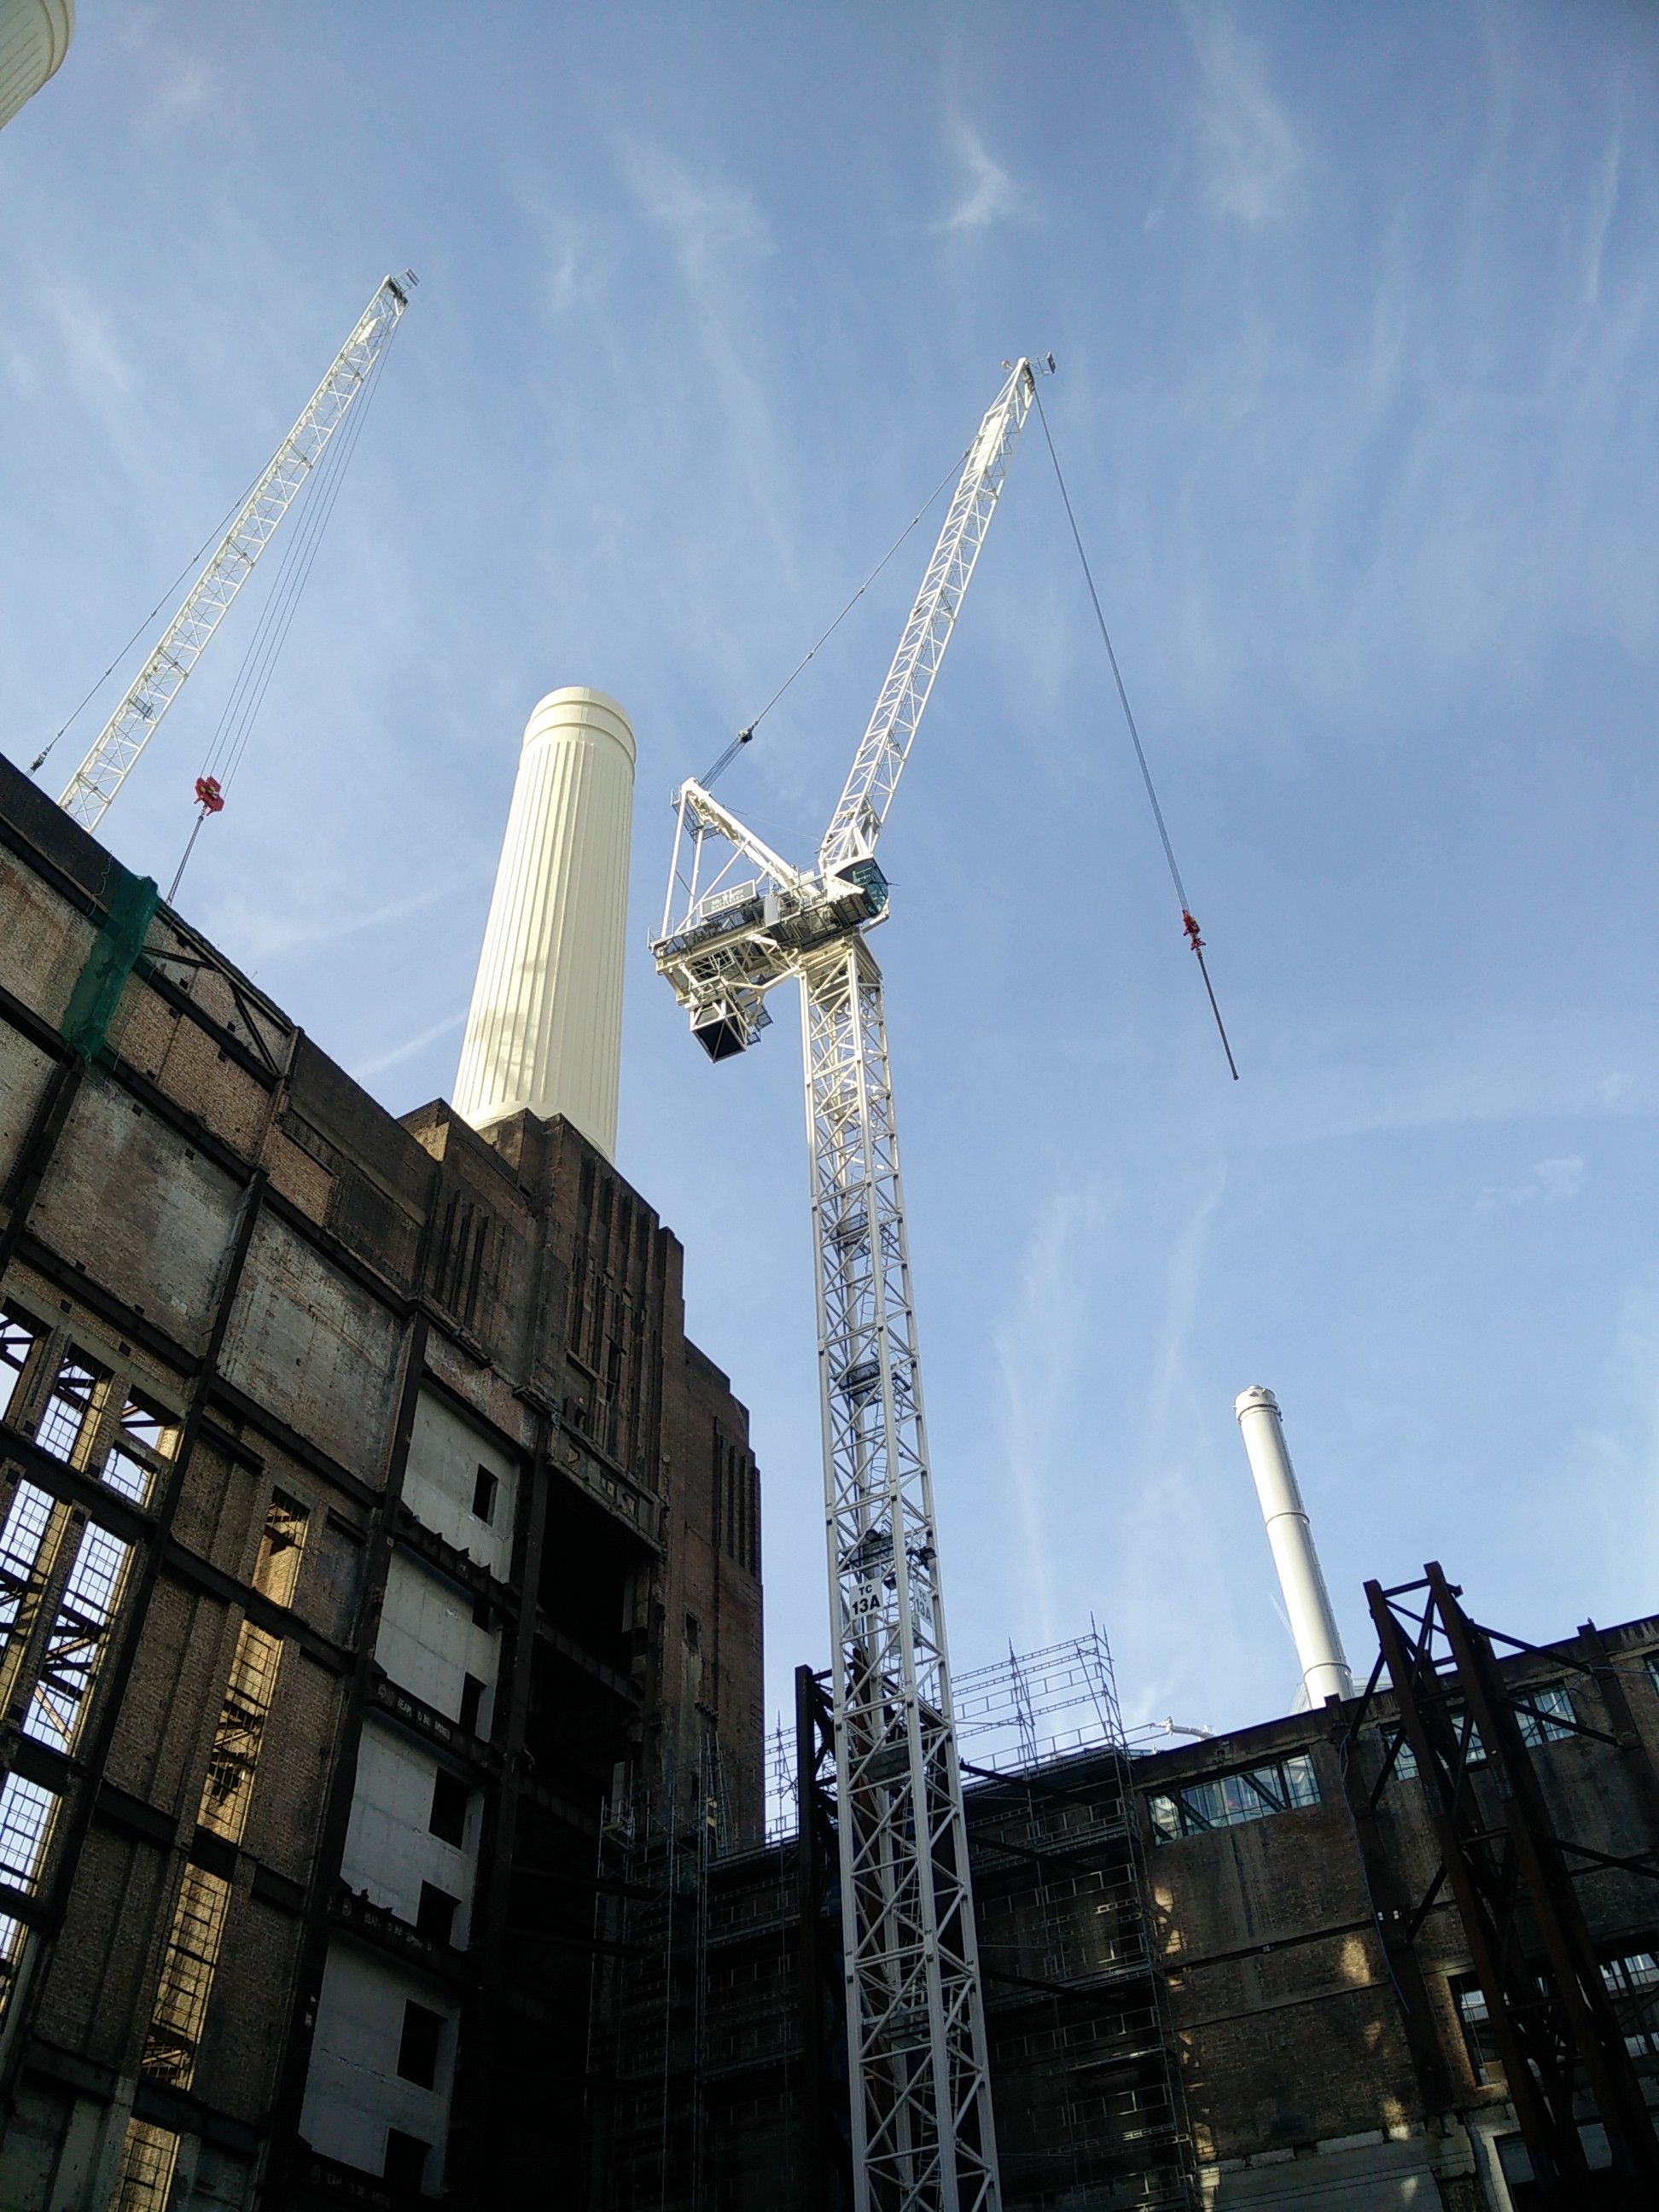 Tower crane foundations